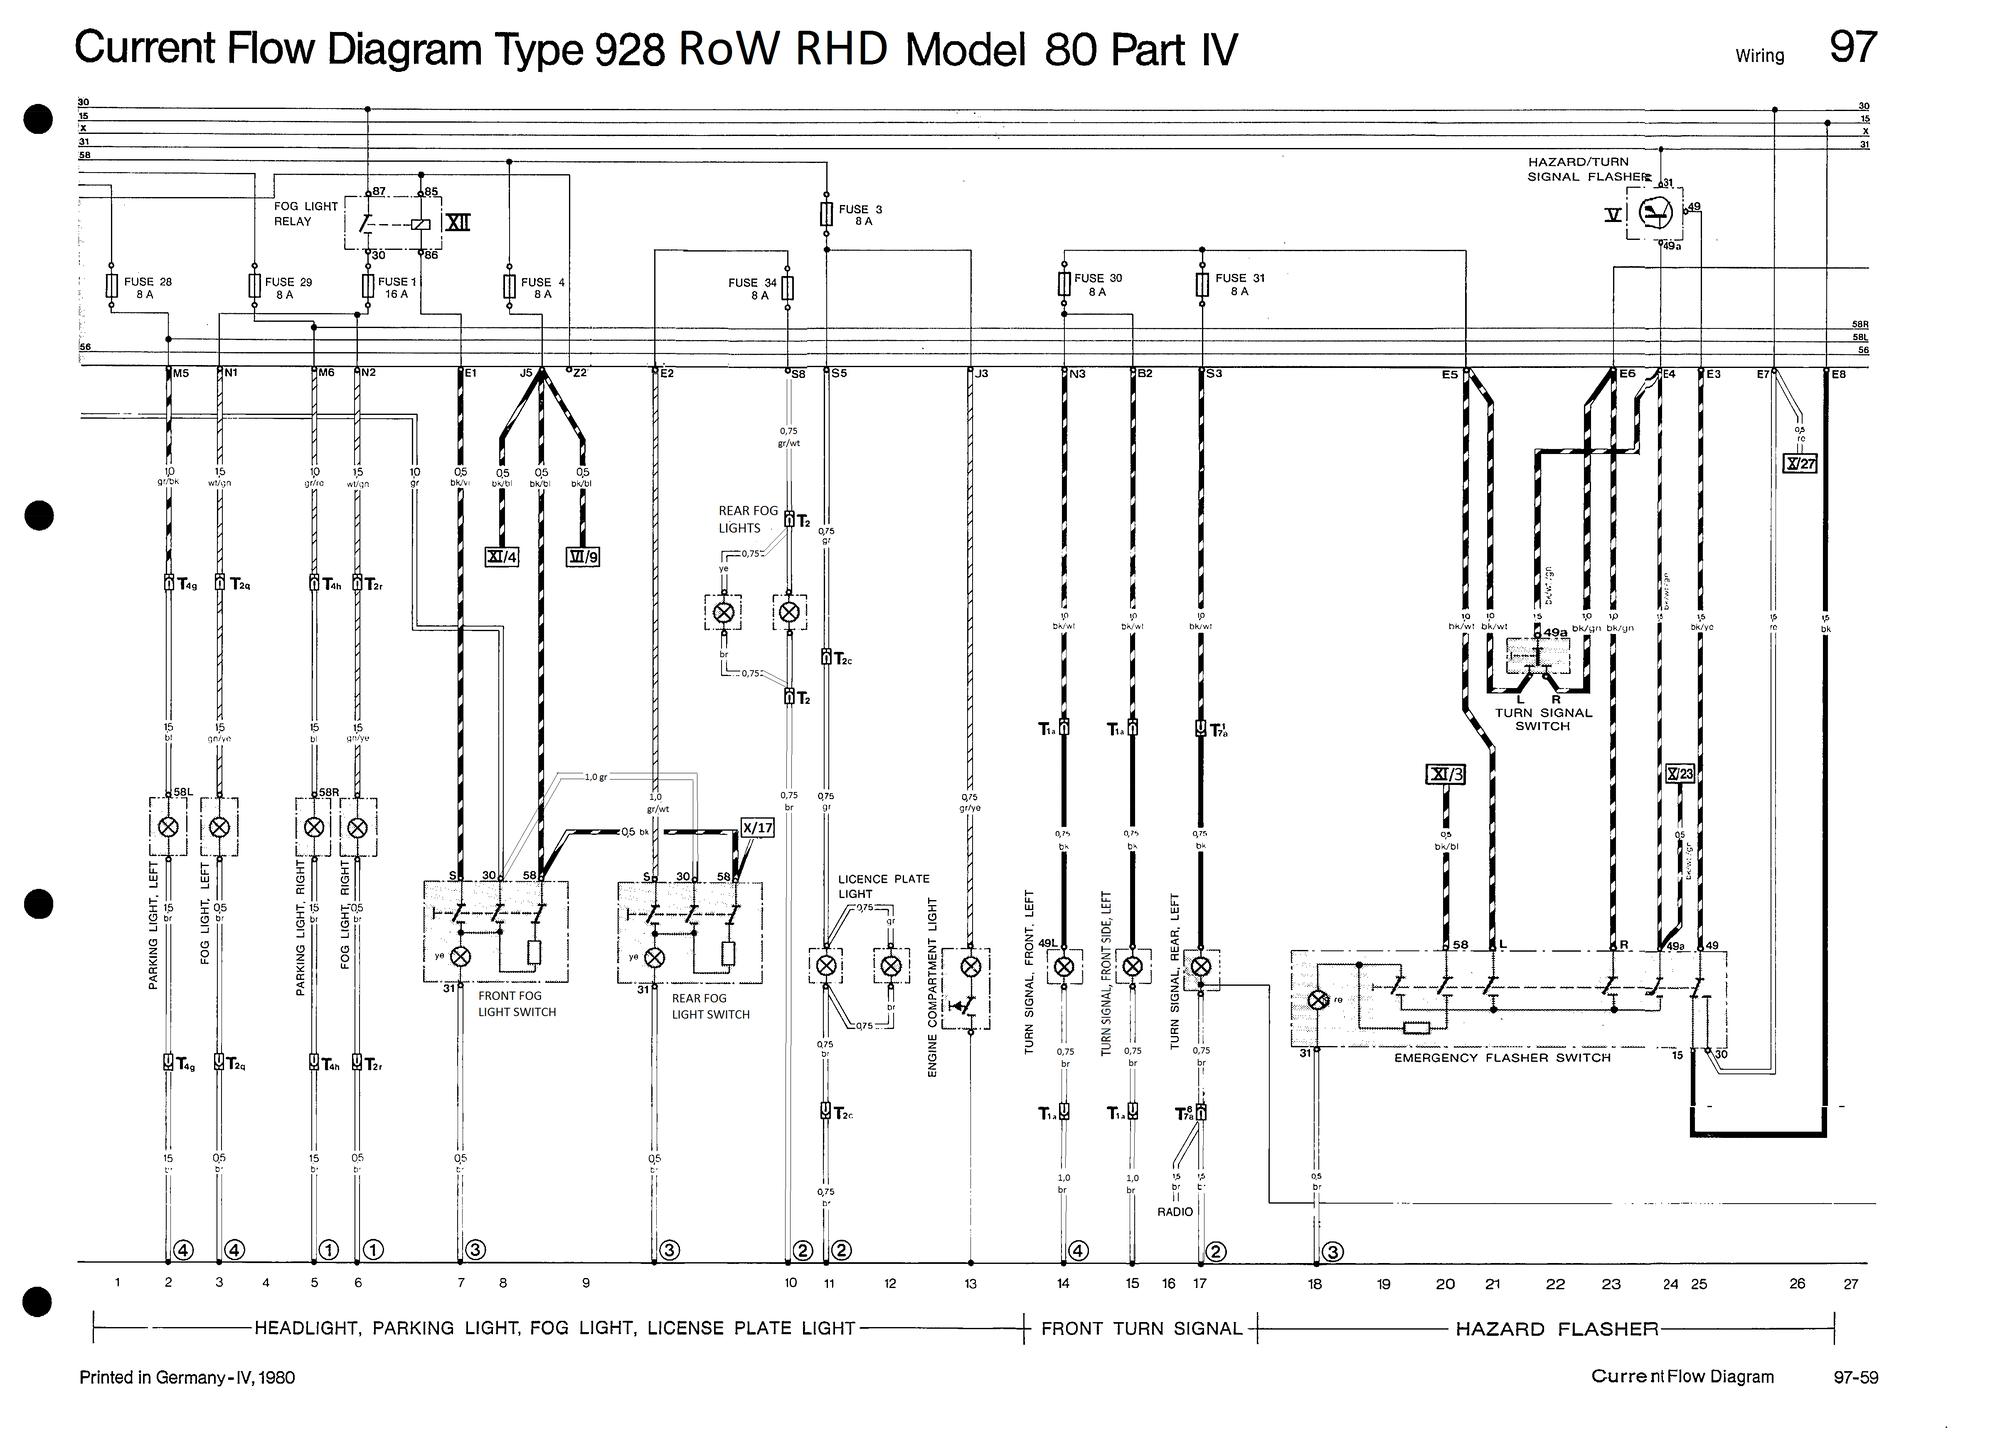 wiring diagram help - re  upgrading to euro driving    fog - take 2 - rennlist